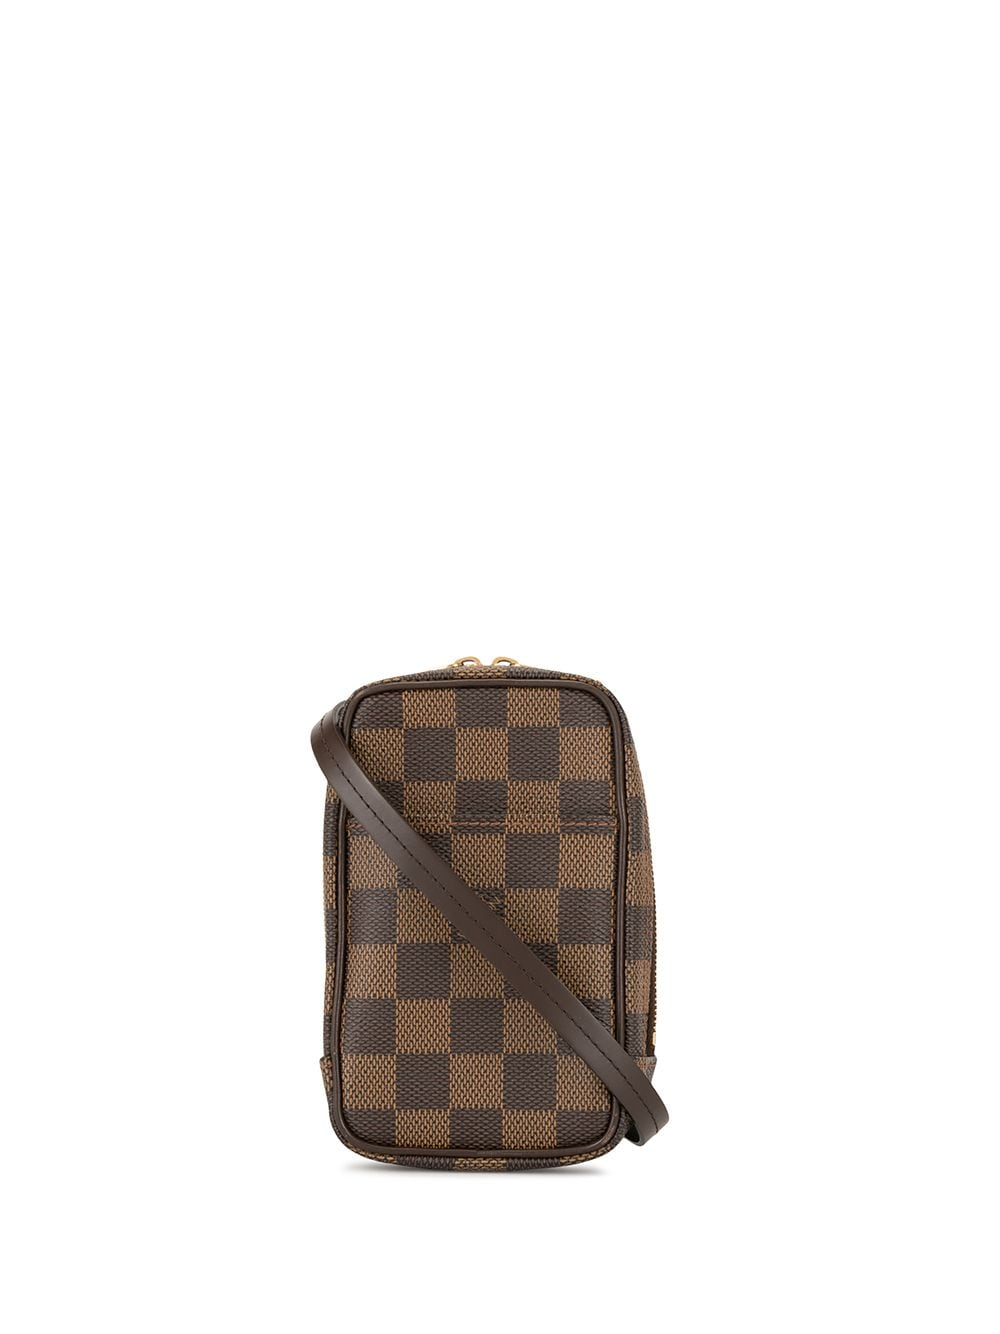 Louis Vuitton Pre-owned Etui Okapi HM Umhängetasche - Braun